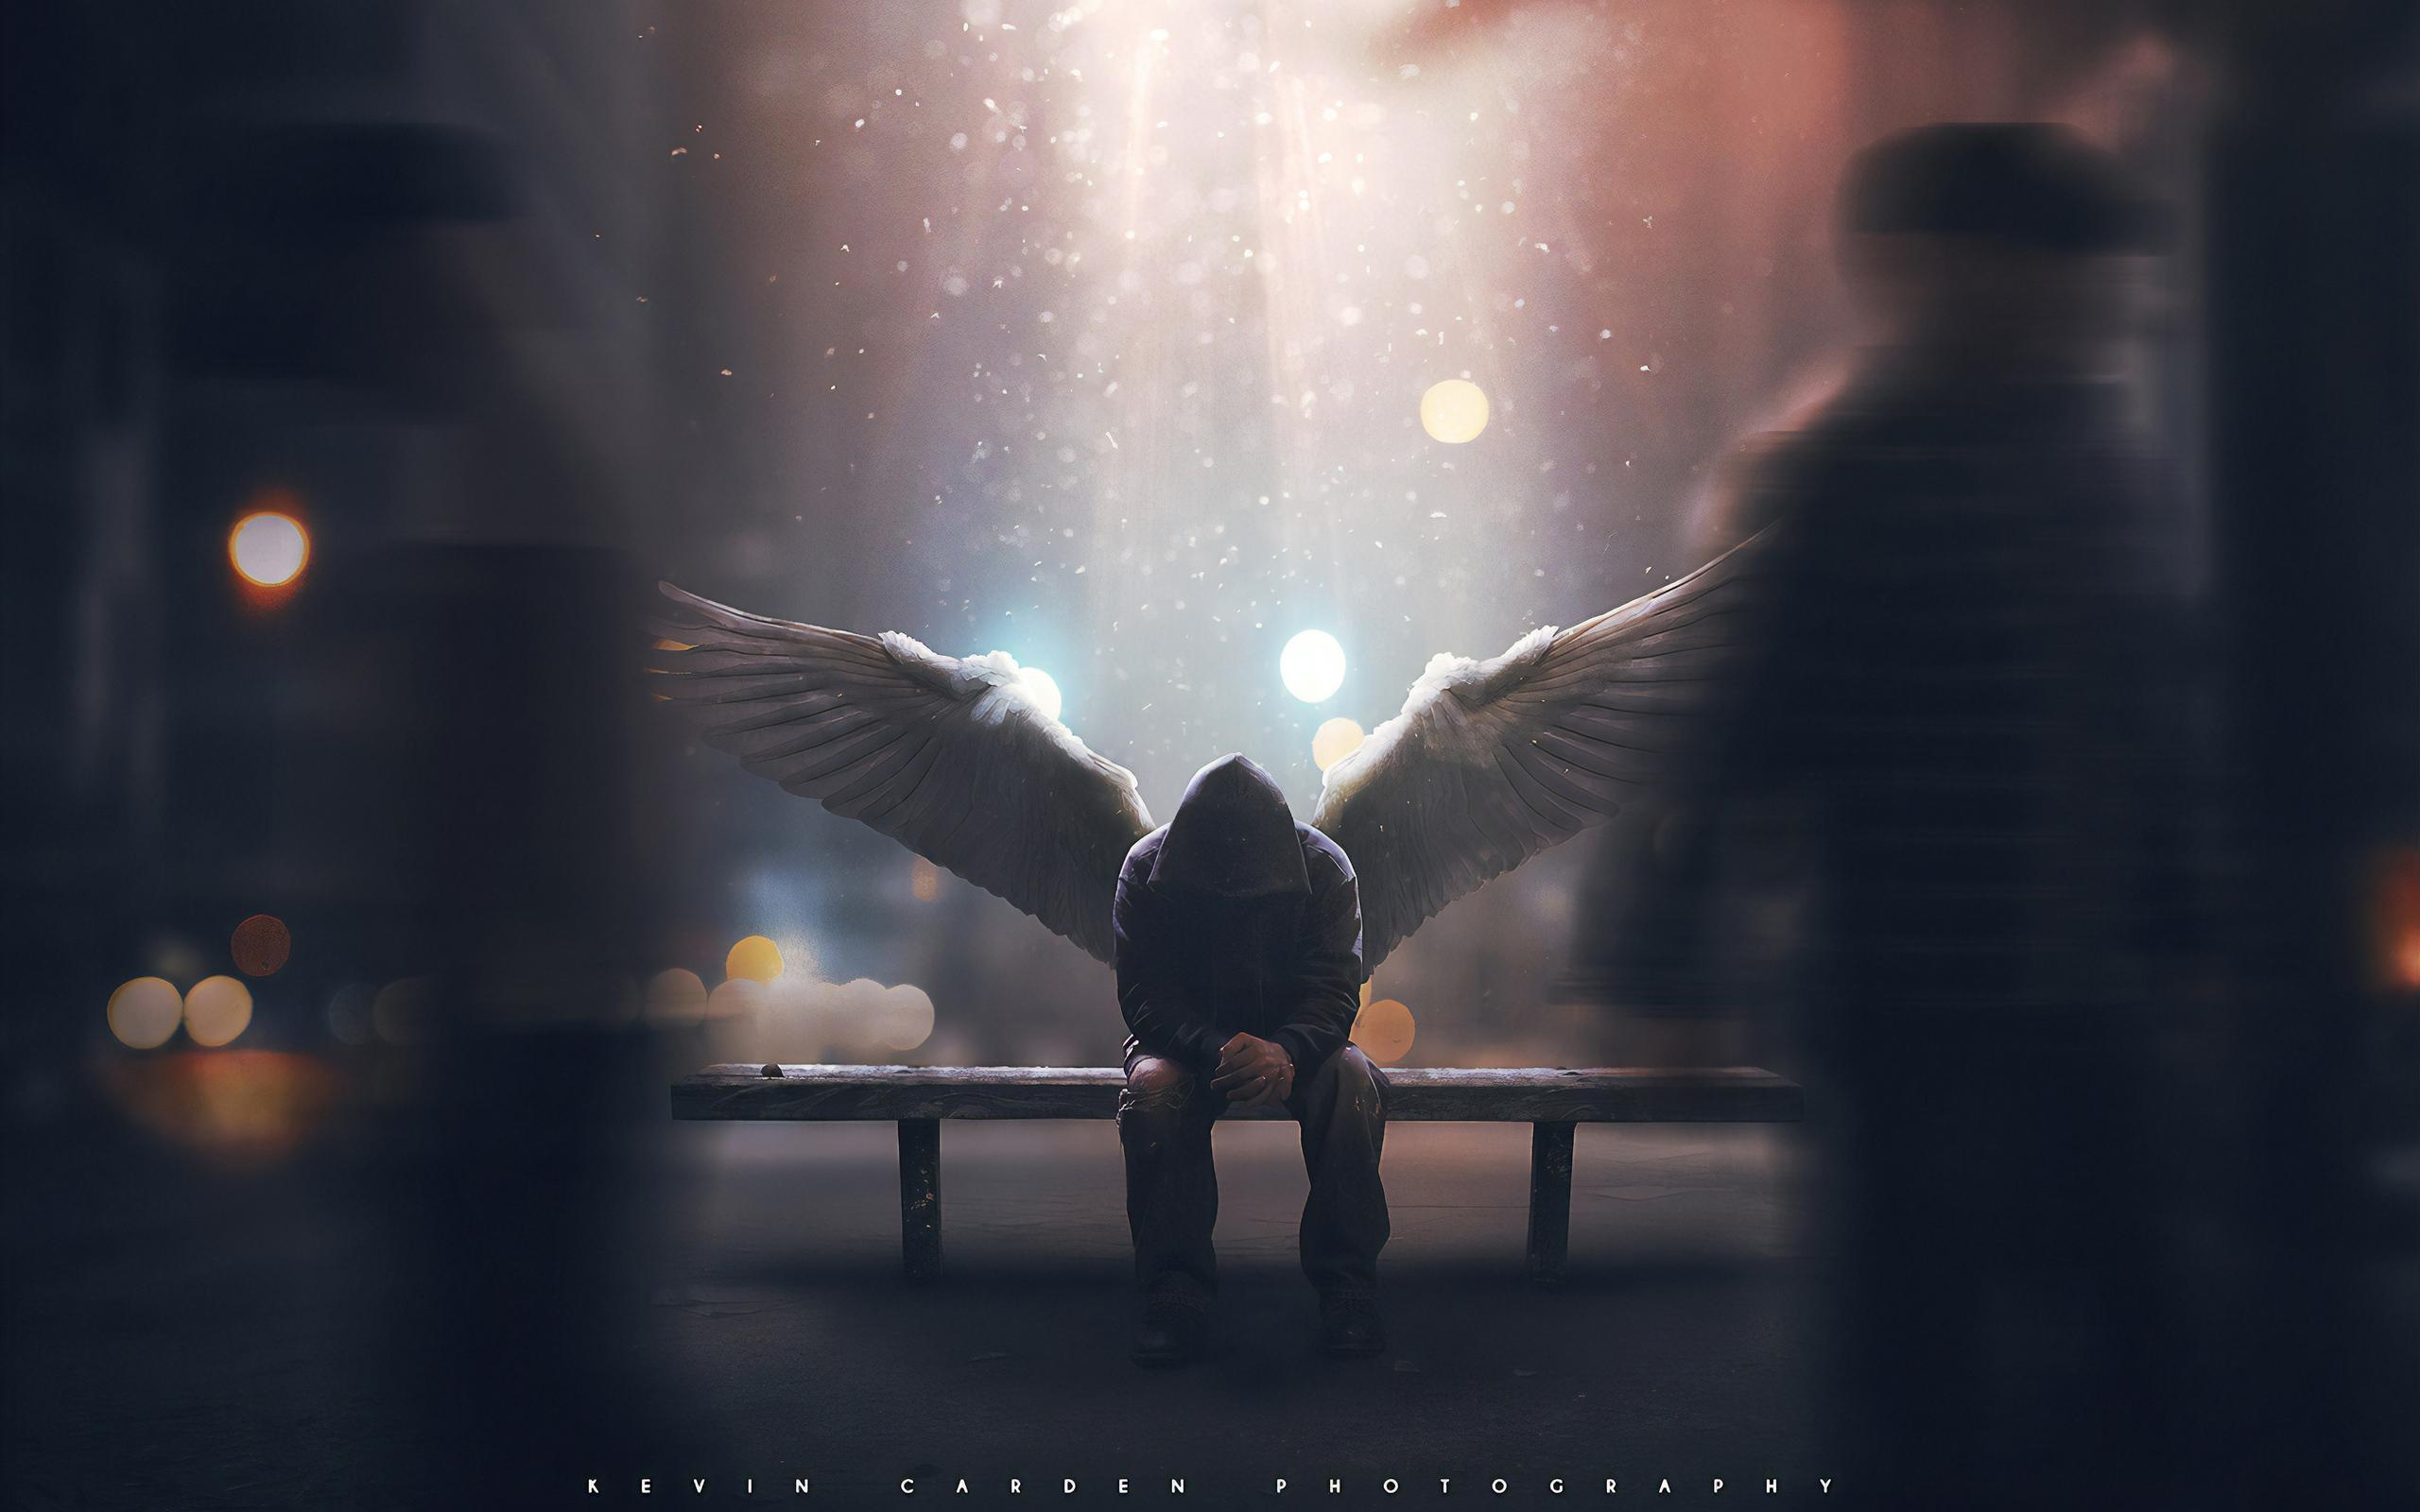 alone-angel-4k-e3.jpg